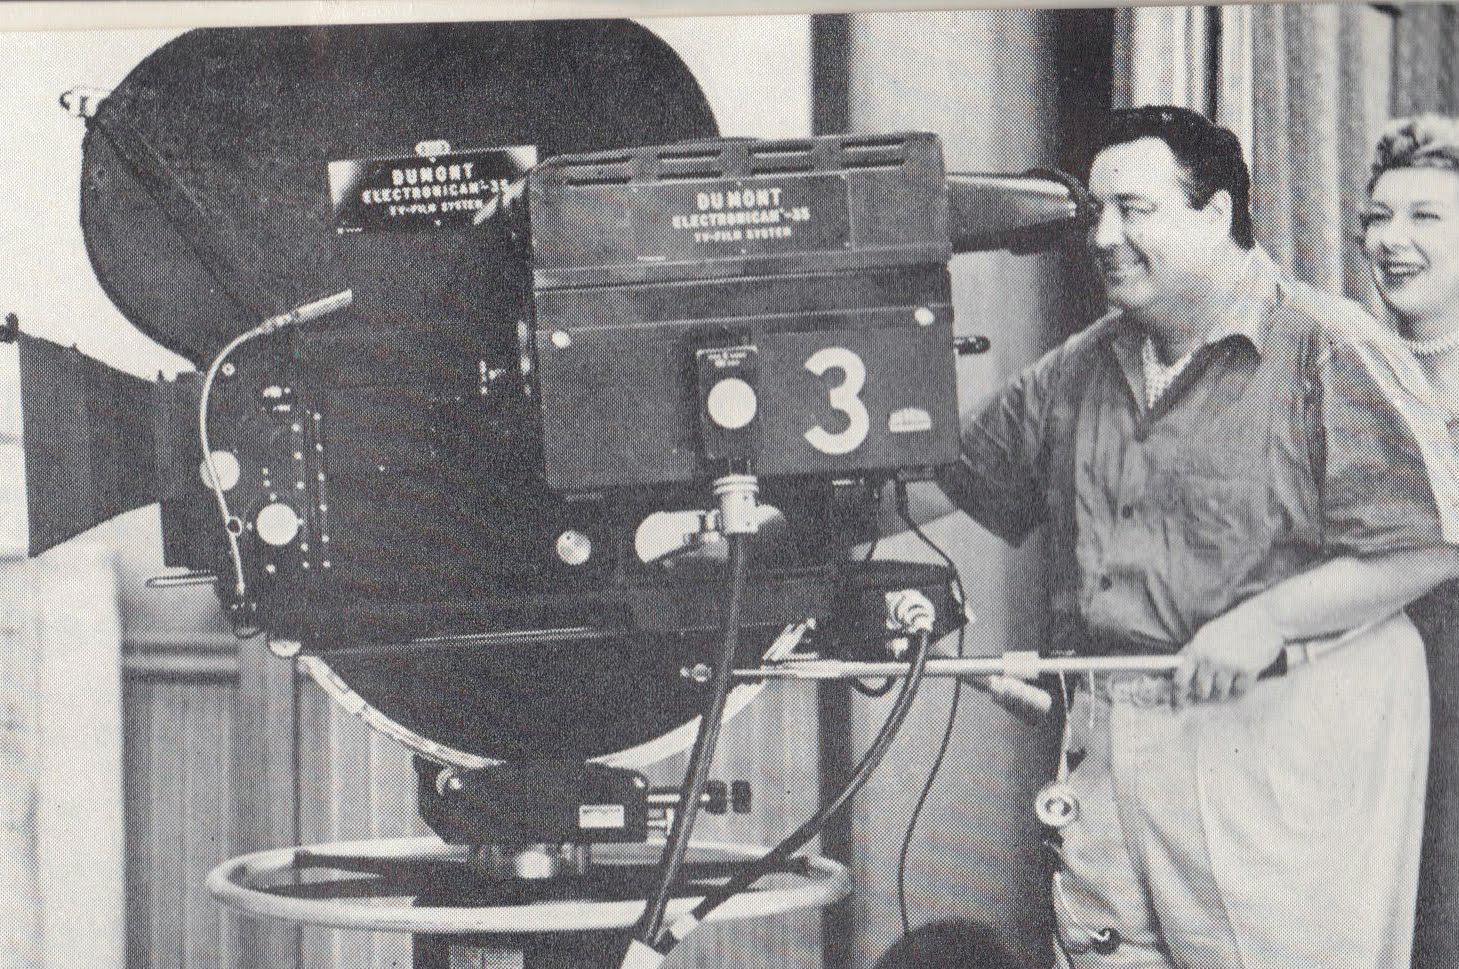 From Kinescopes to Digital Cinema 12